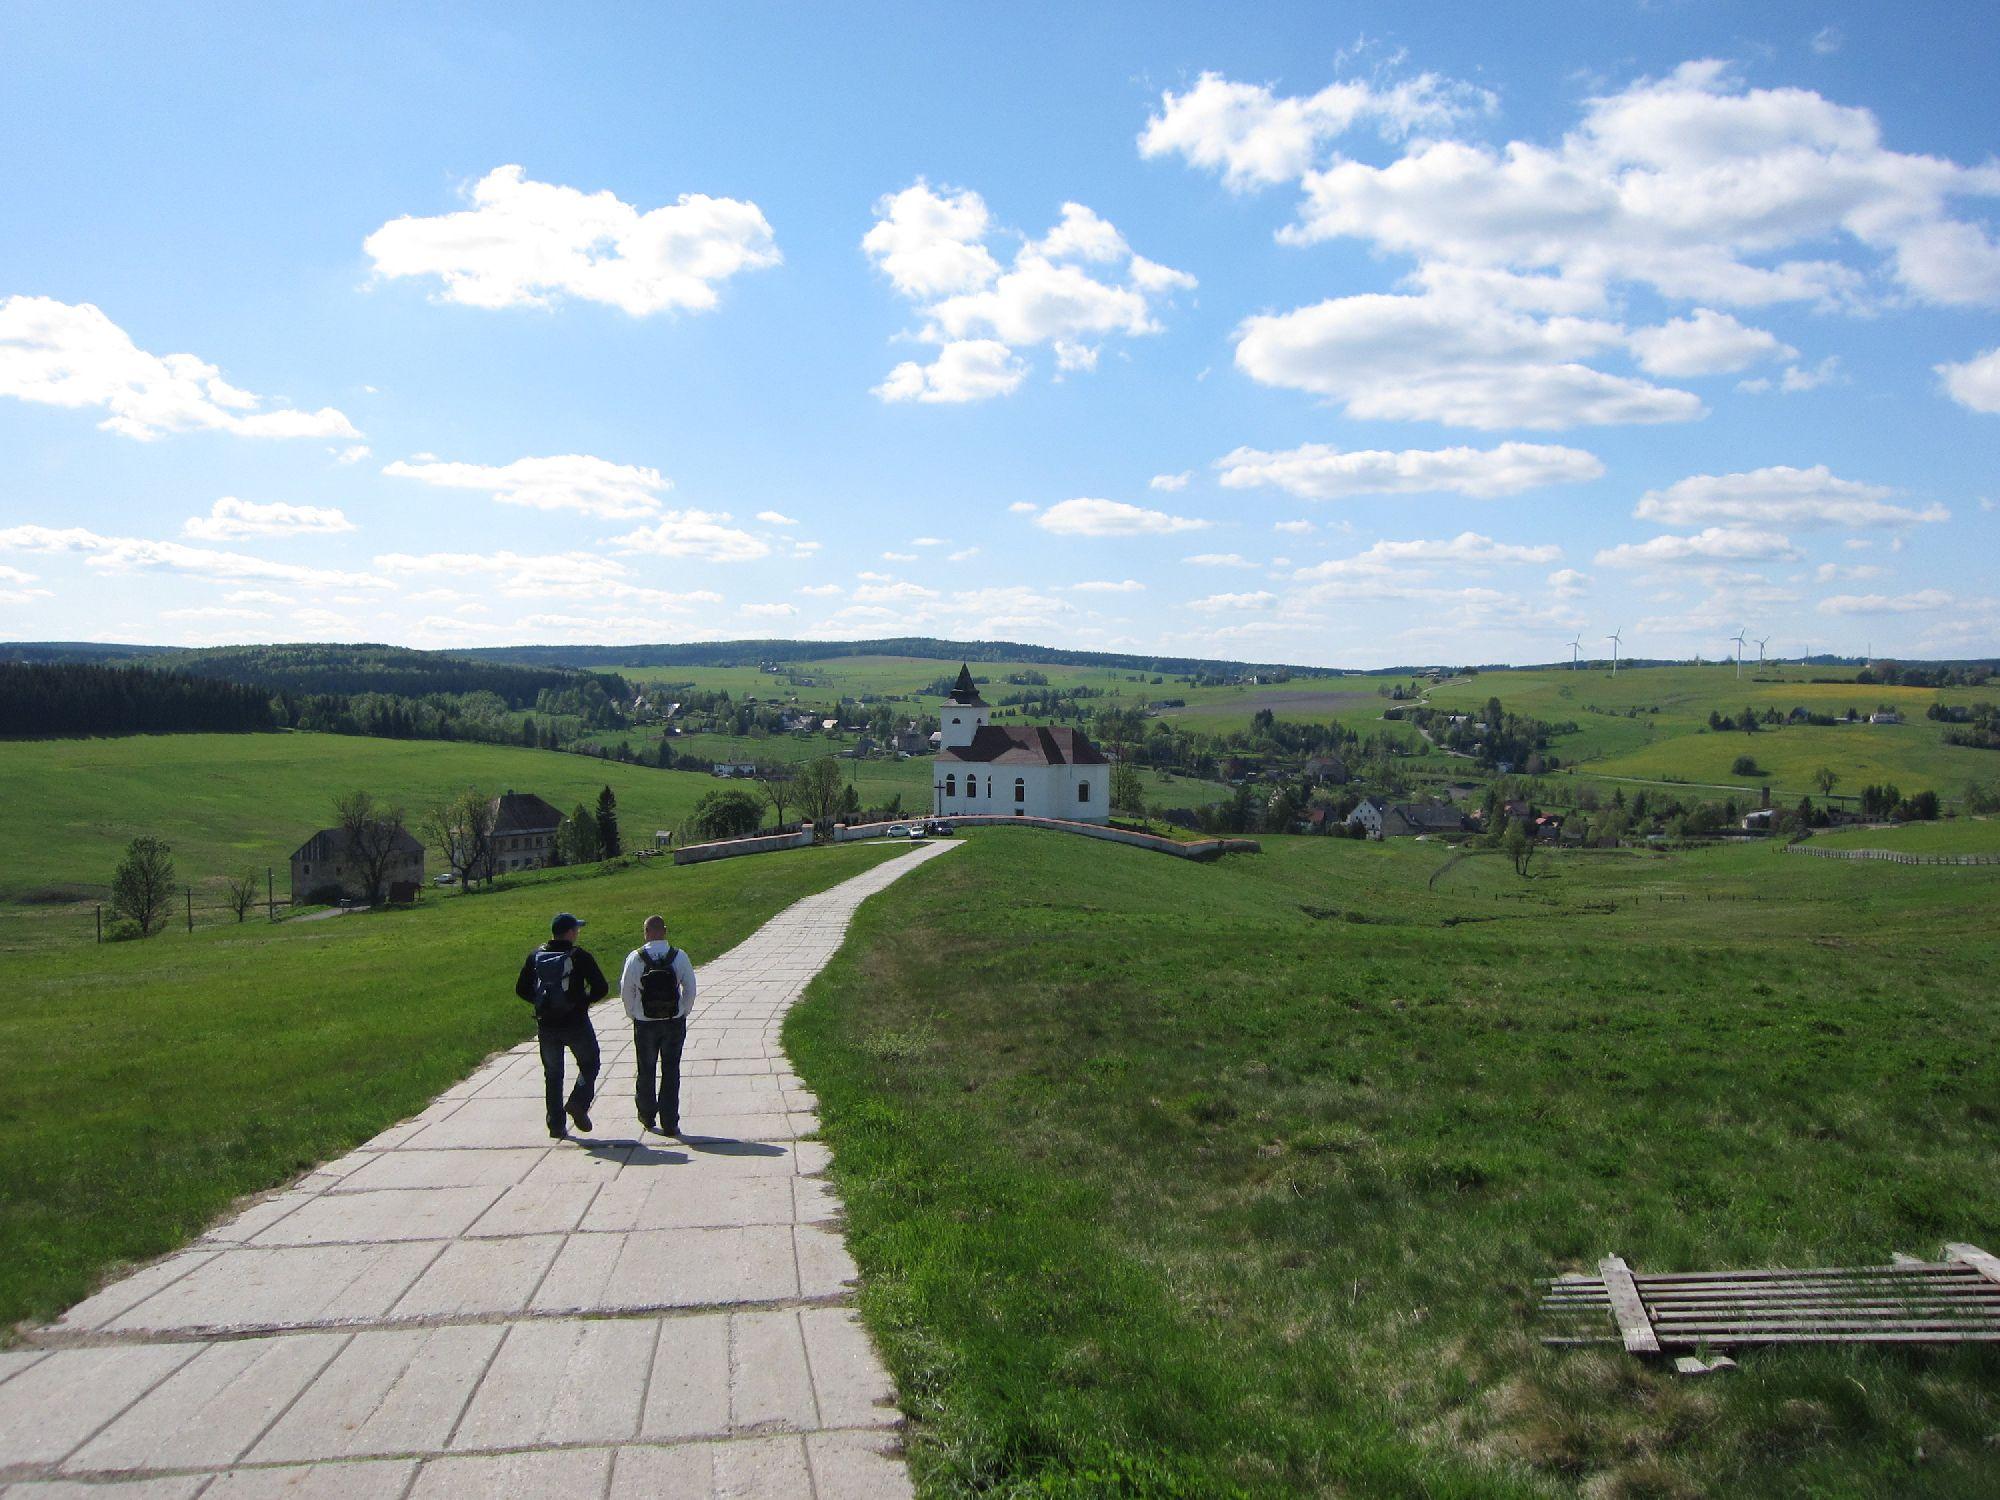 Wanderung Richtung Rübenau